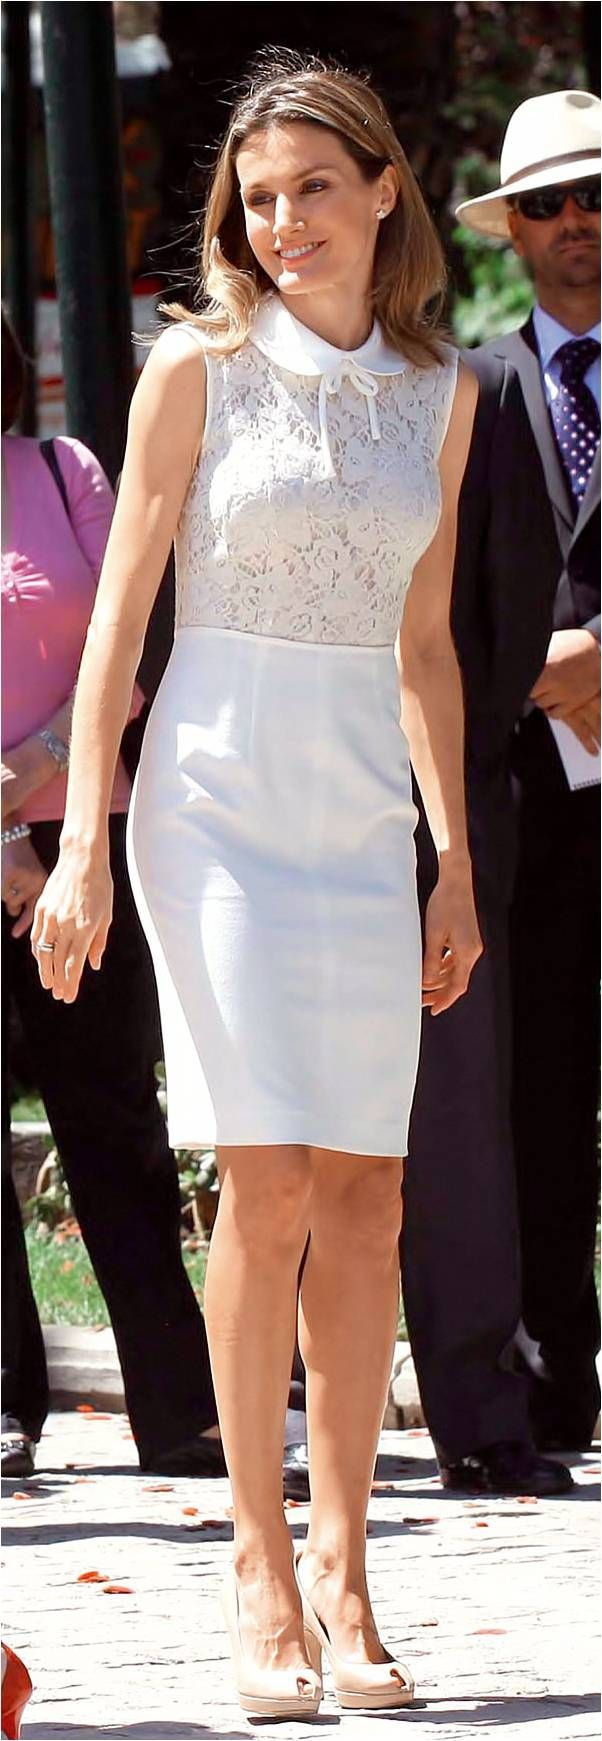 Queen Letizia - white Peter Pan collar dress